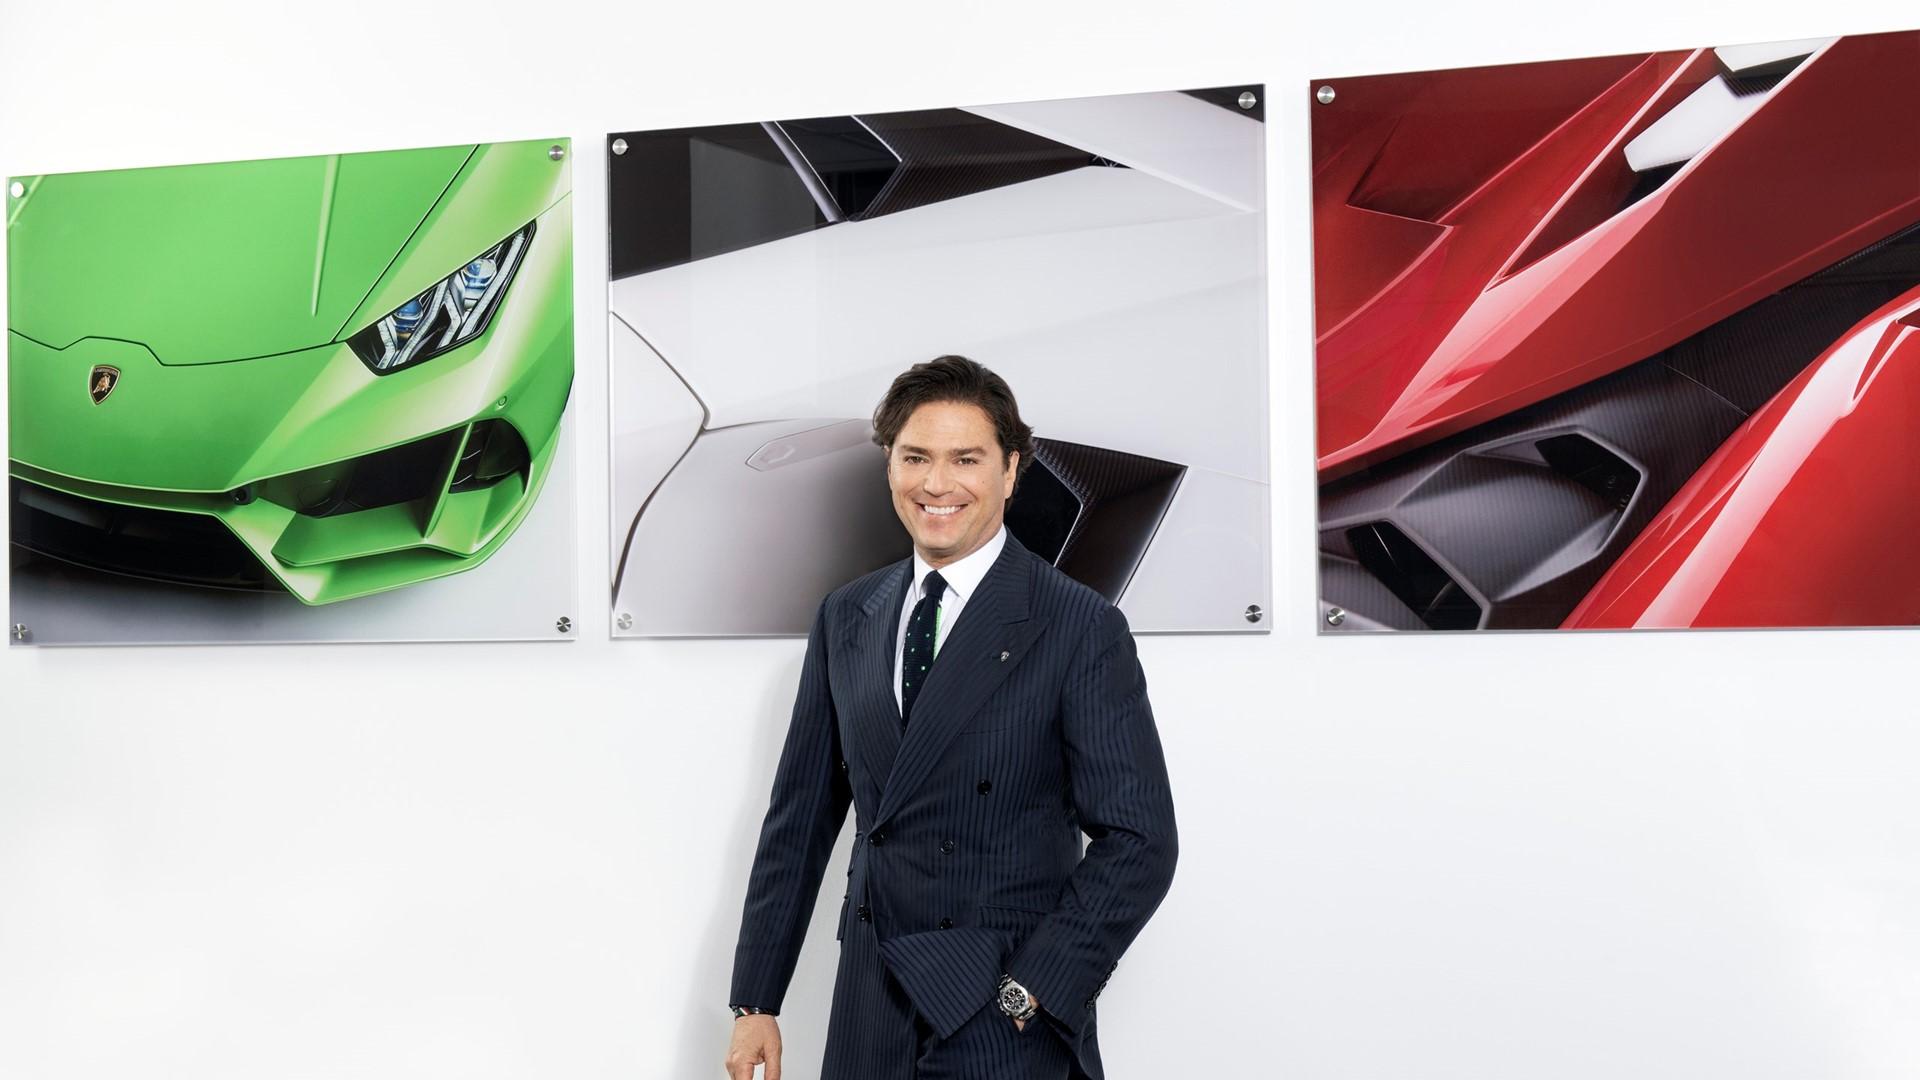 Automobili Lamborghini makes new Board of Management appointments - Image 8